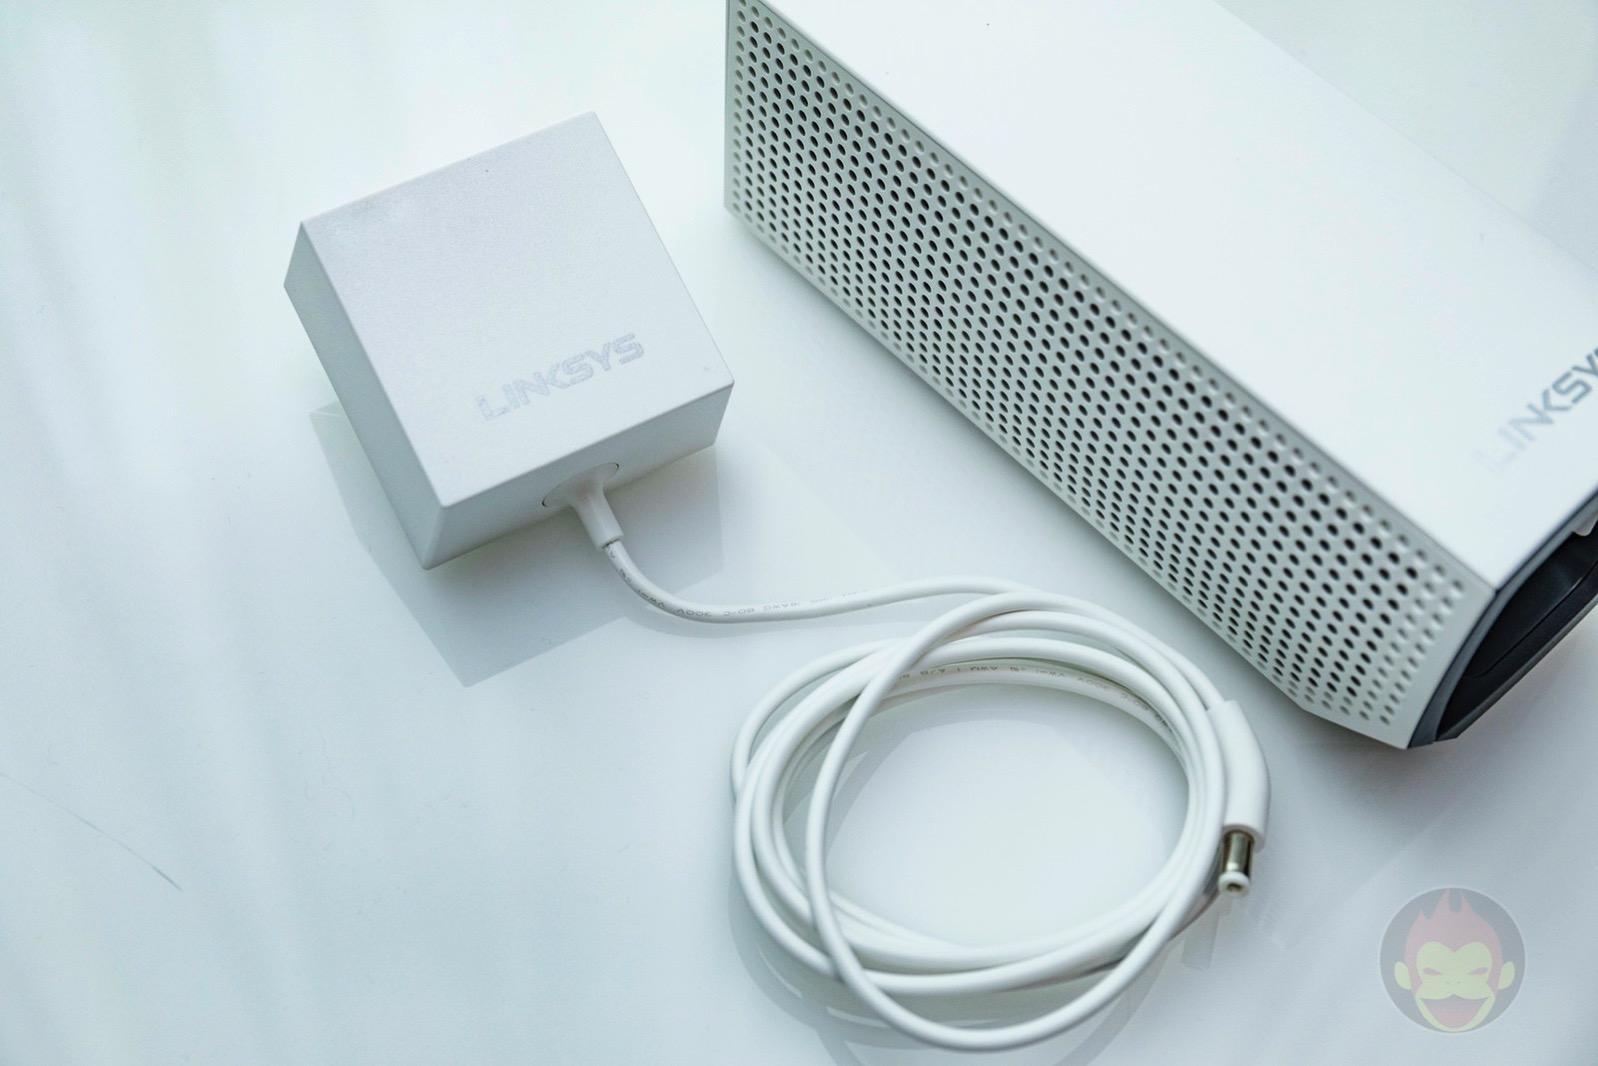 Linksys-Velop-WiFi-Router-06.jpg